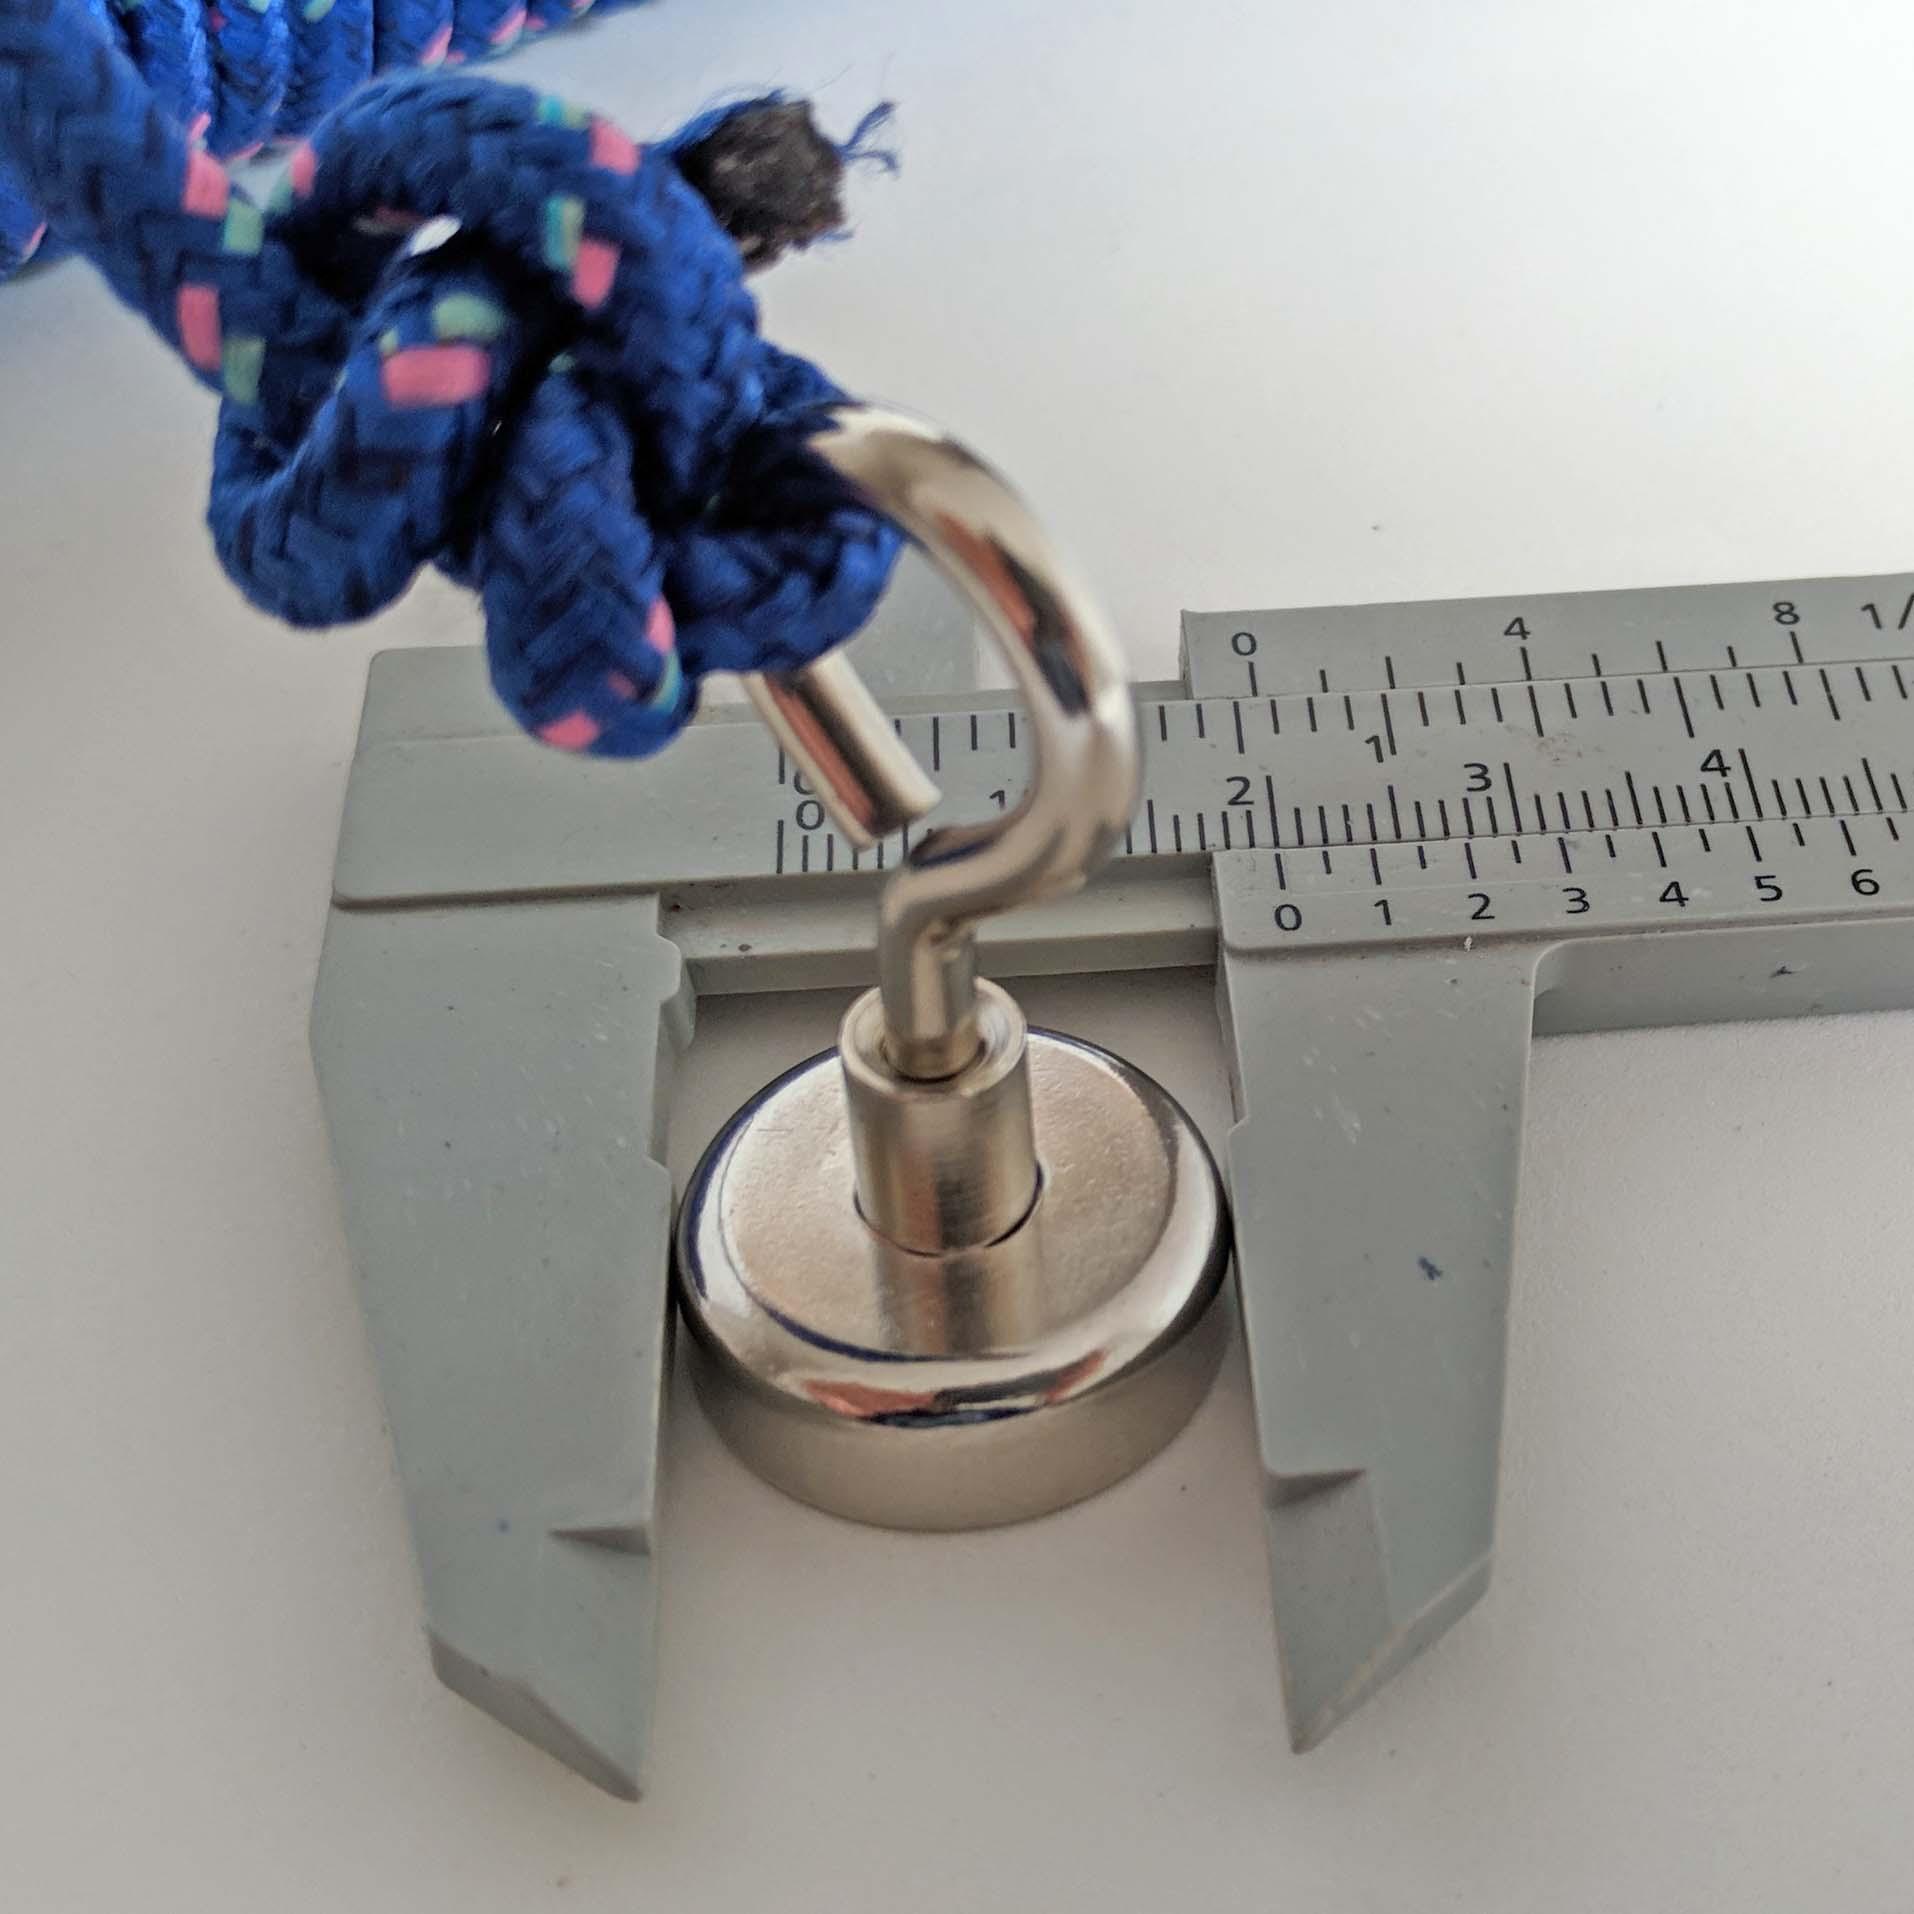 Imã pesca magnética 6Kg, imã fixador, ima de neodimio magnetismo